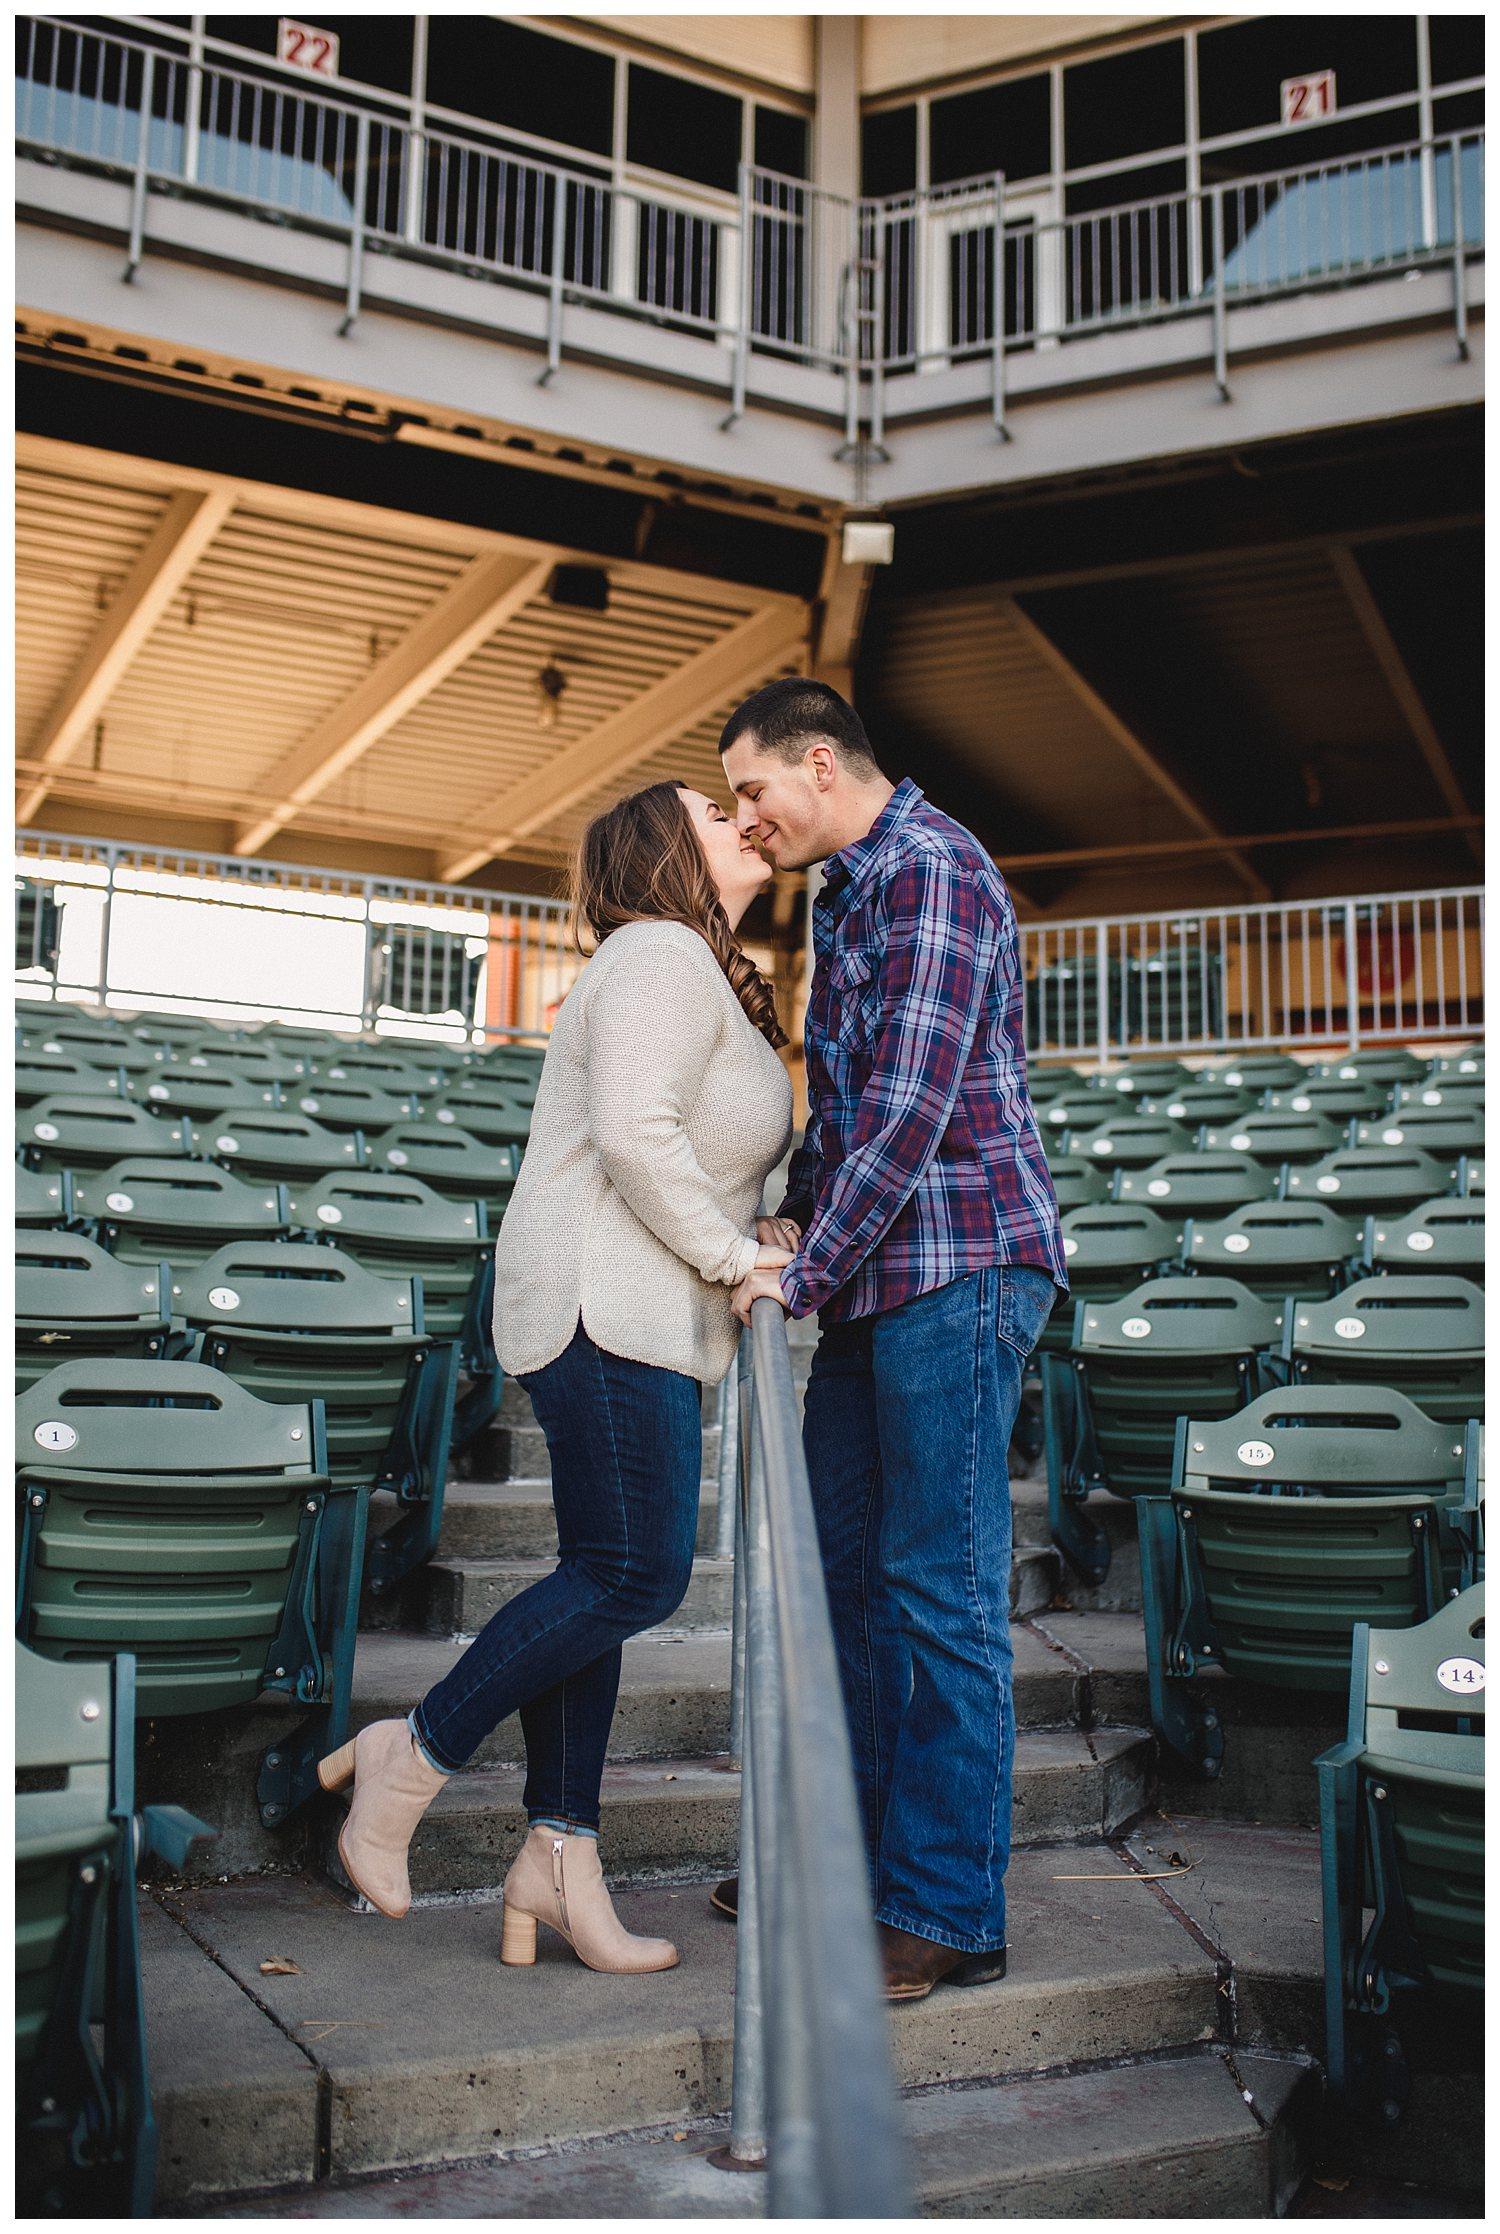 Kelsey_Diane_Photography_T-Bones_Stadium_Kansas_Wandering_Adventourus_Kansas_City_Engagement_0092.jpg